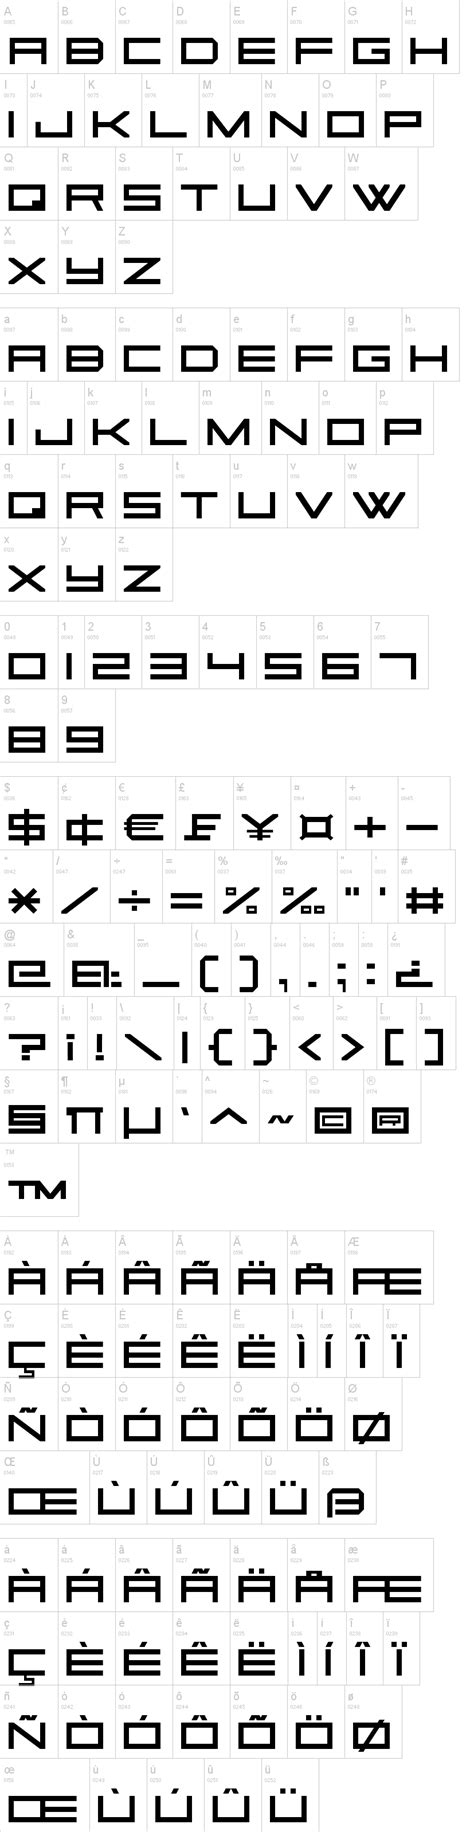 dafont sans serif square sans serif 7 dafont com